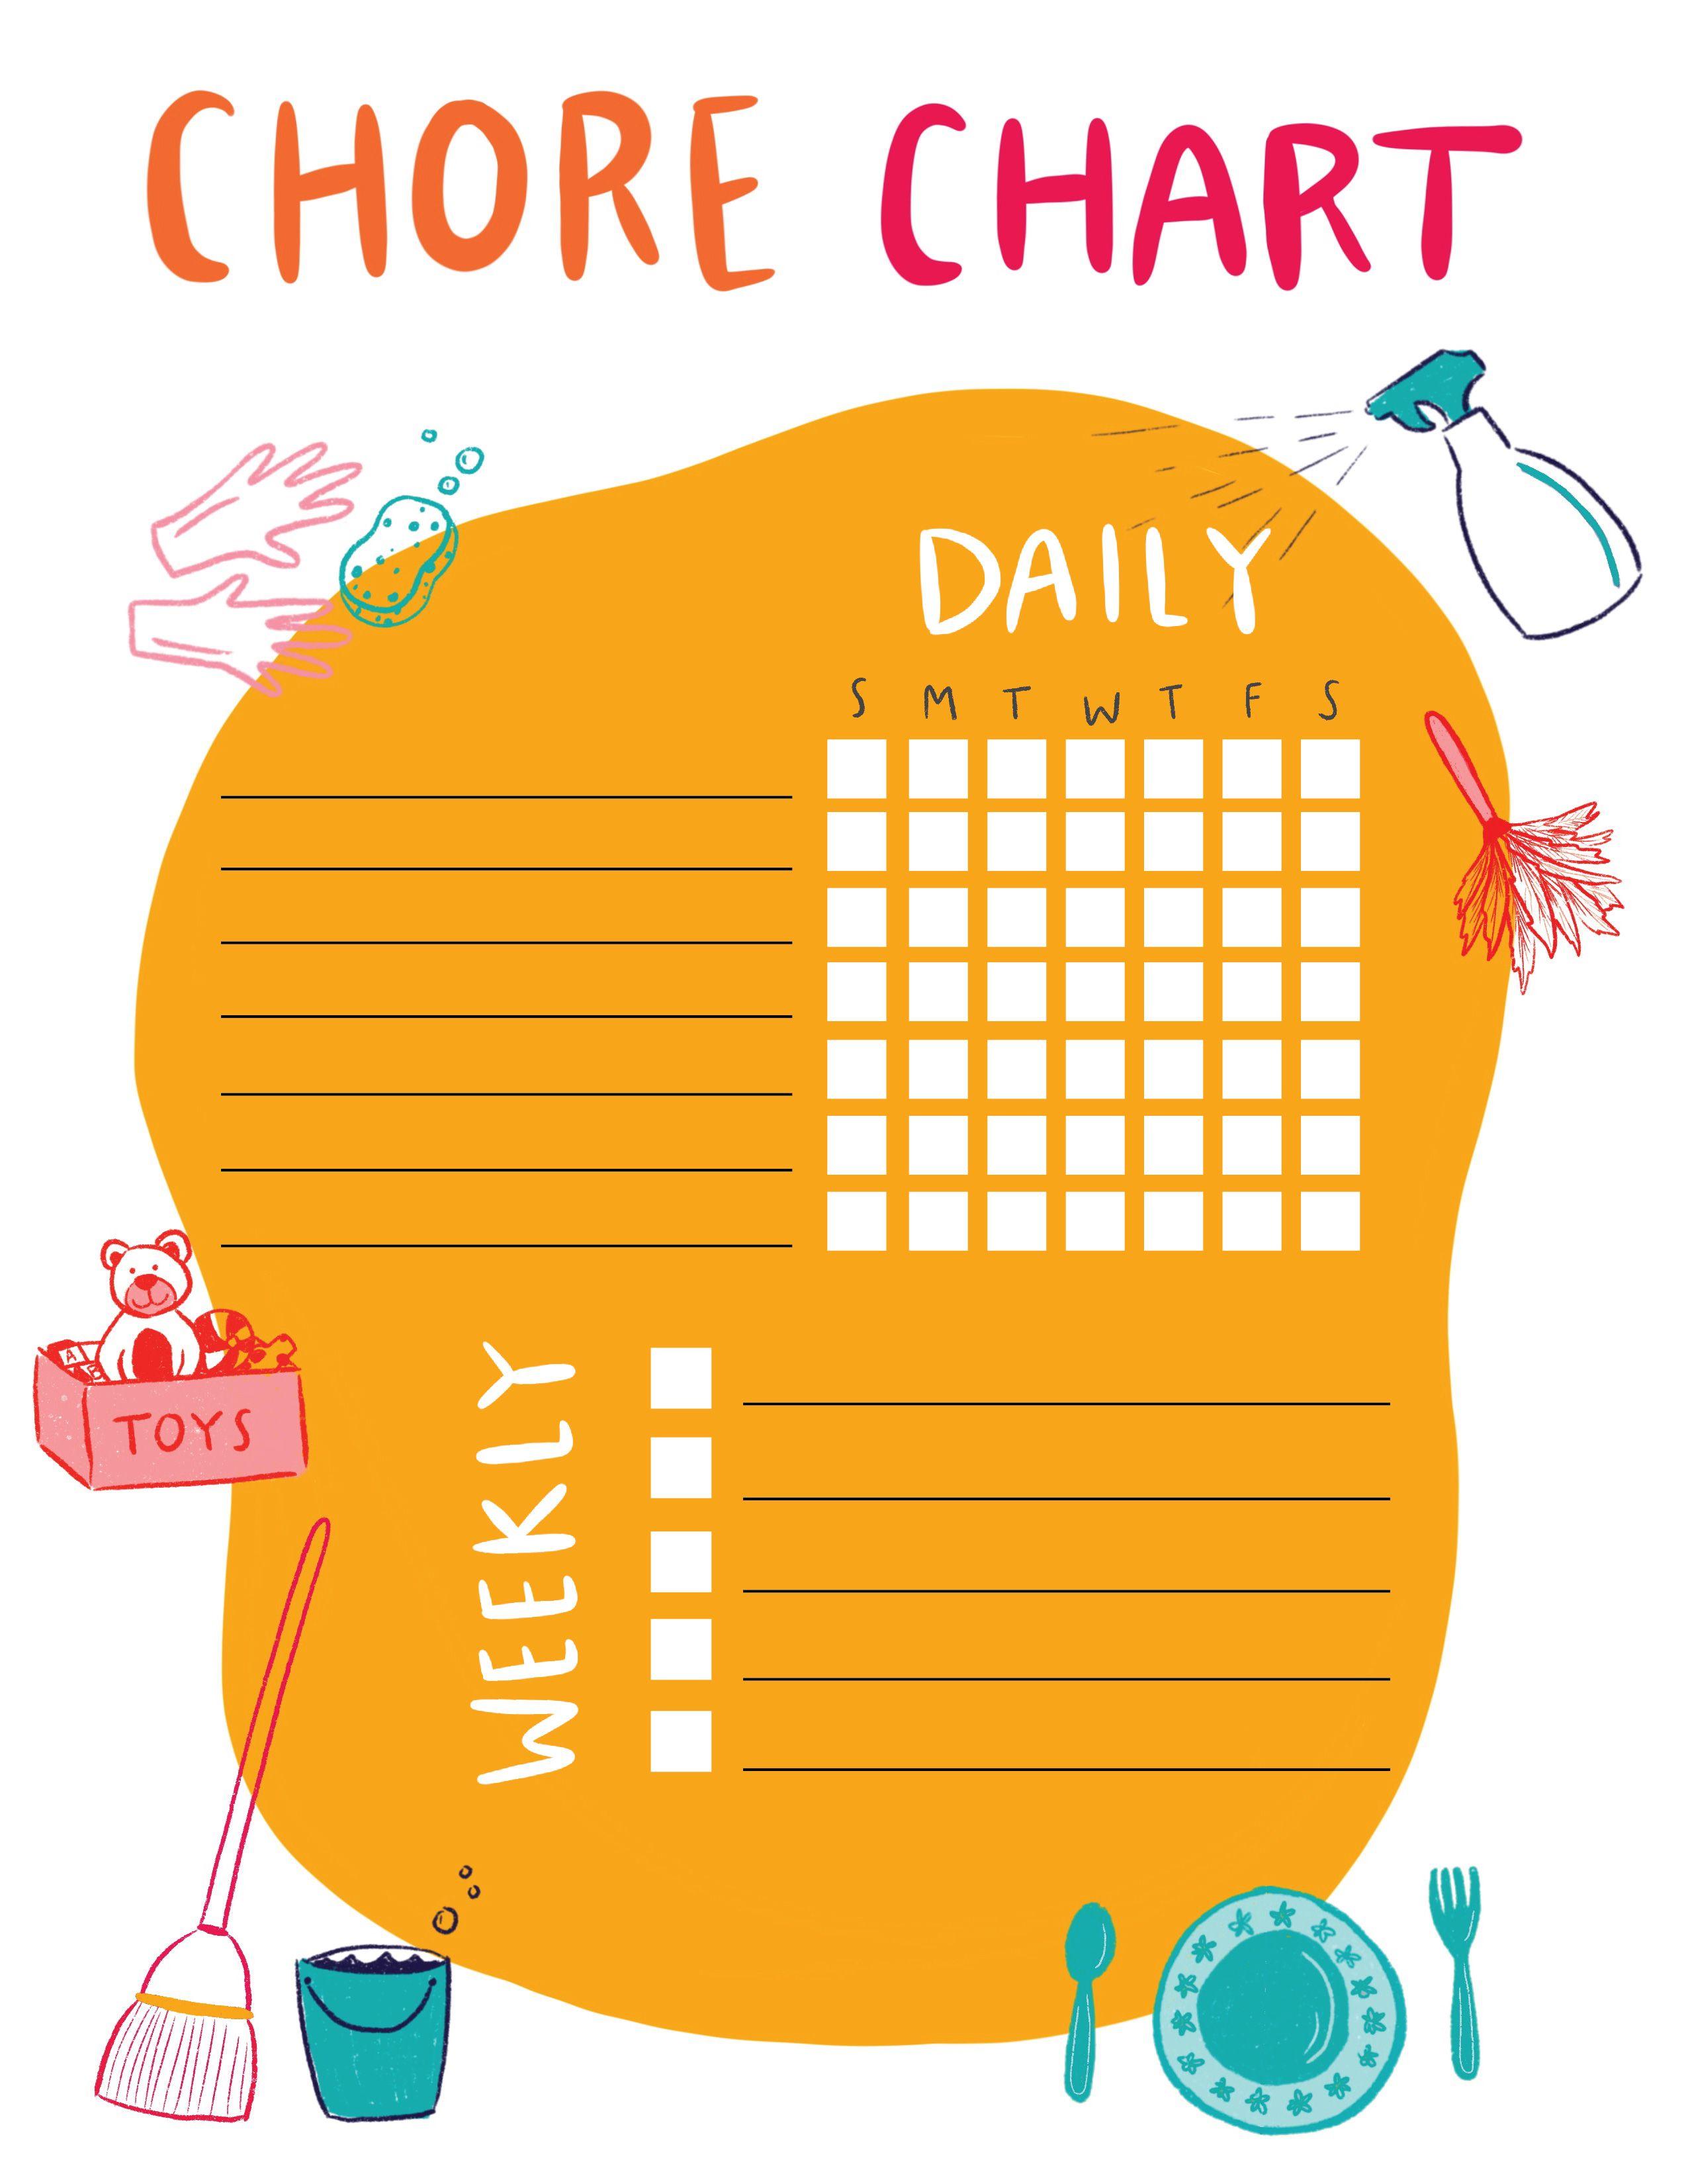 Chore Chart Printable For Kids